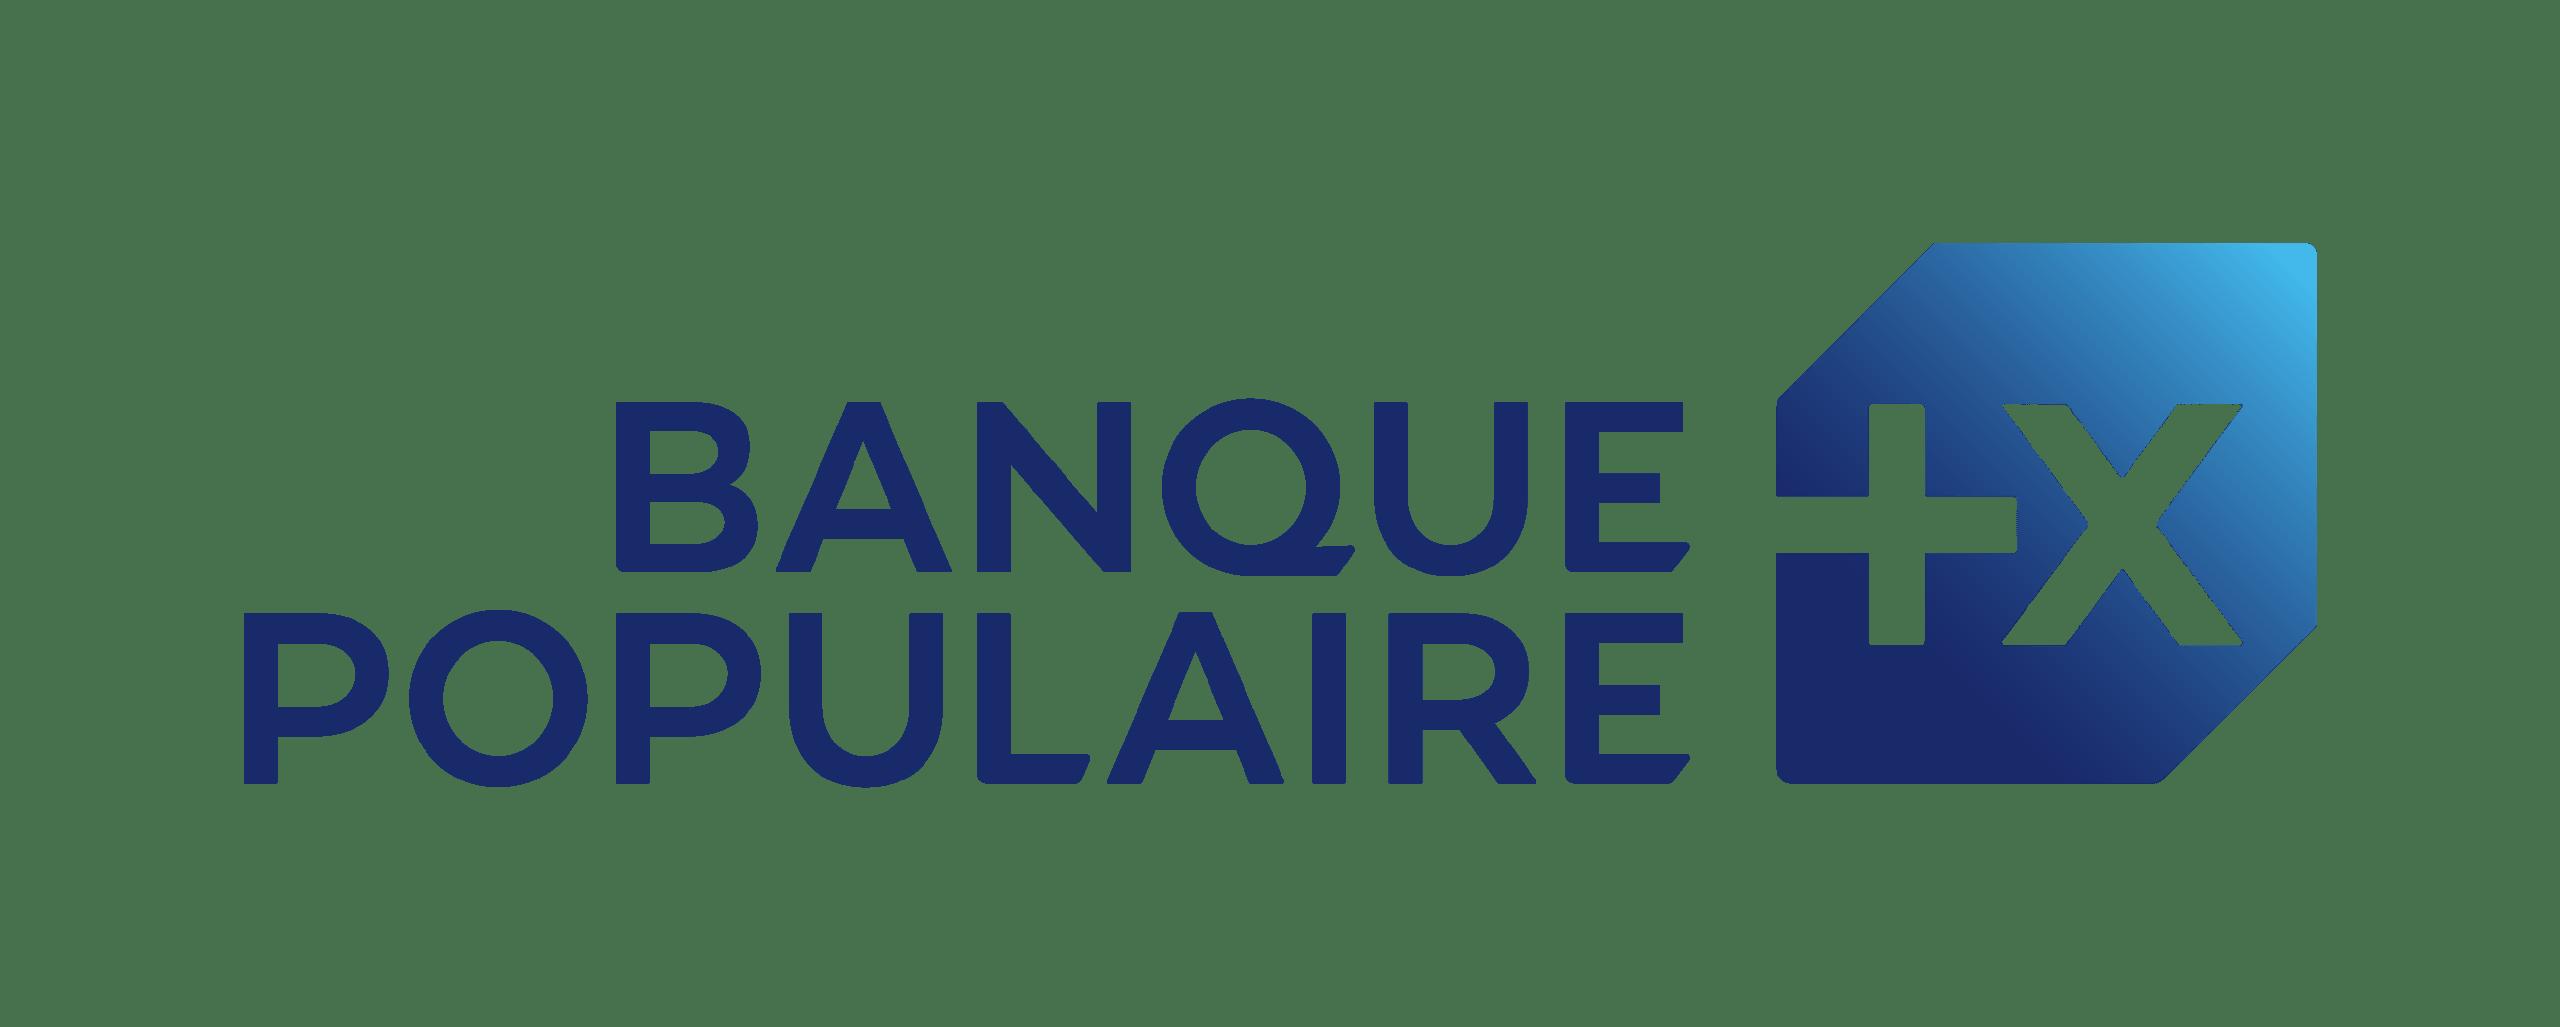 Logo banque populaire - prime 2021